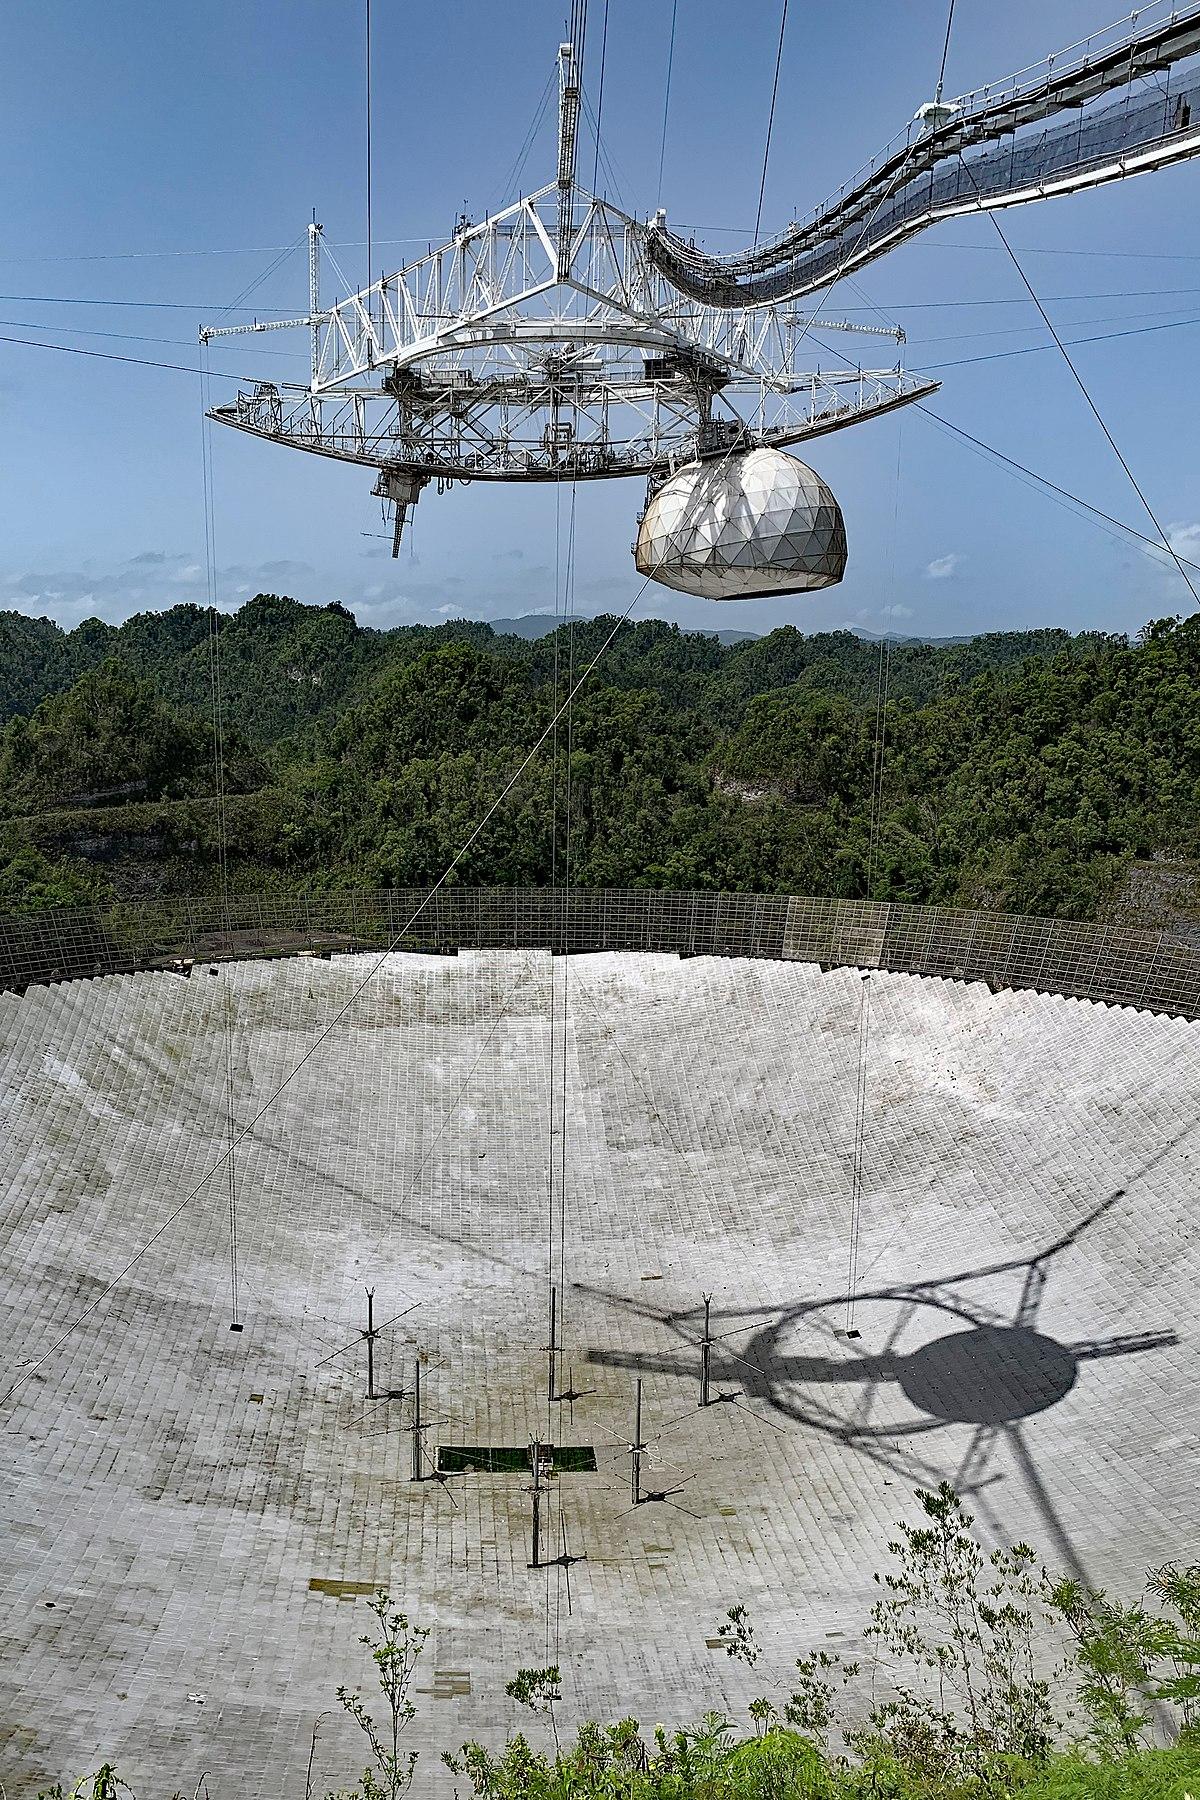 Arecibo radio telescope SJU 06 2019 6144.jpg